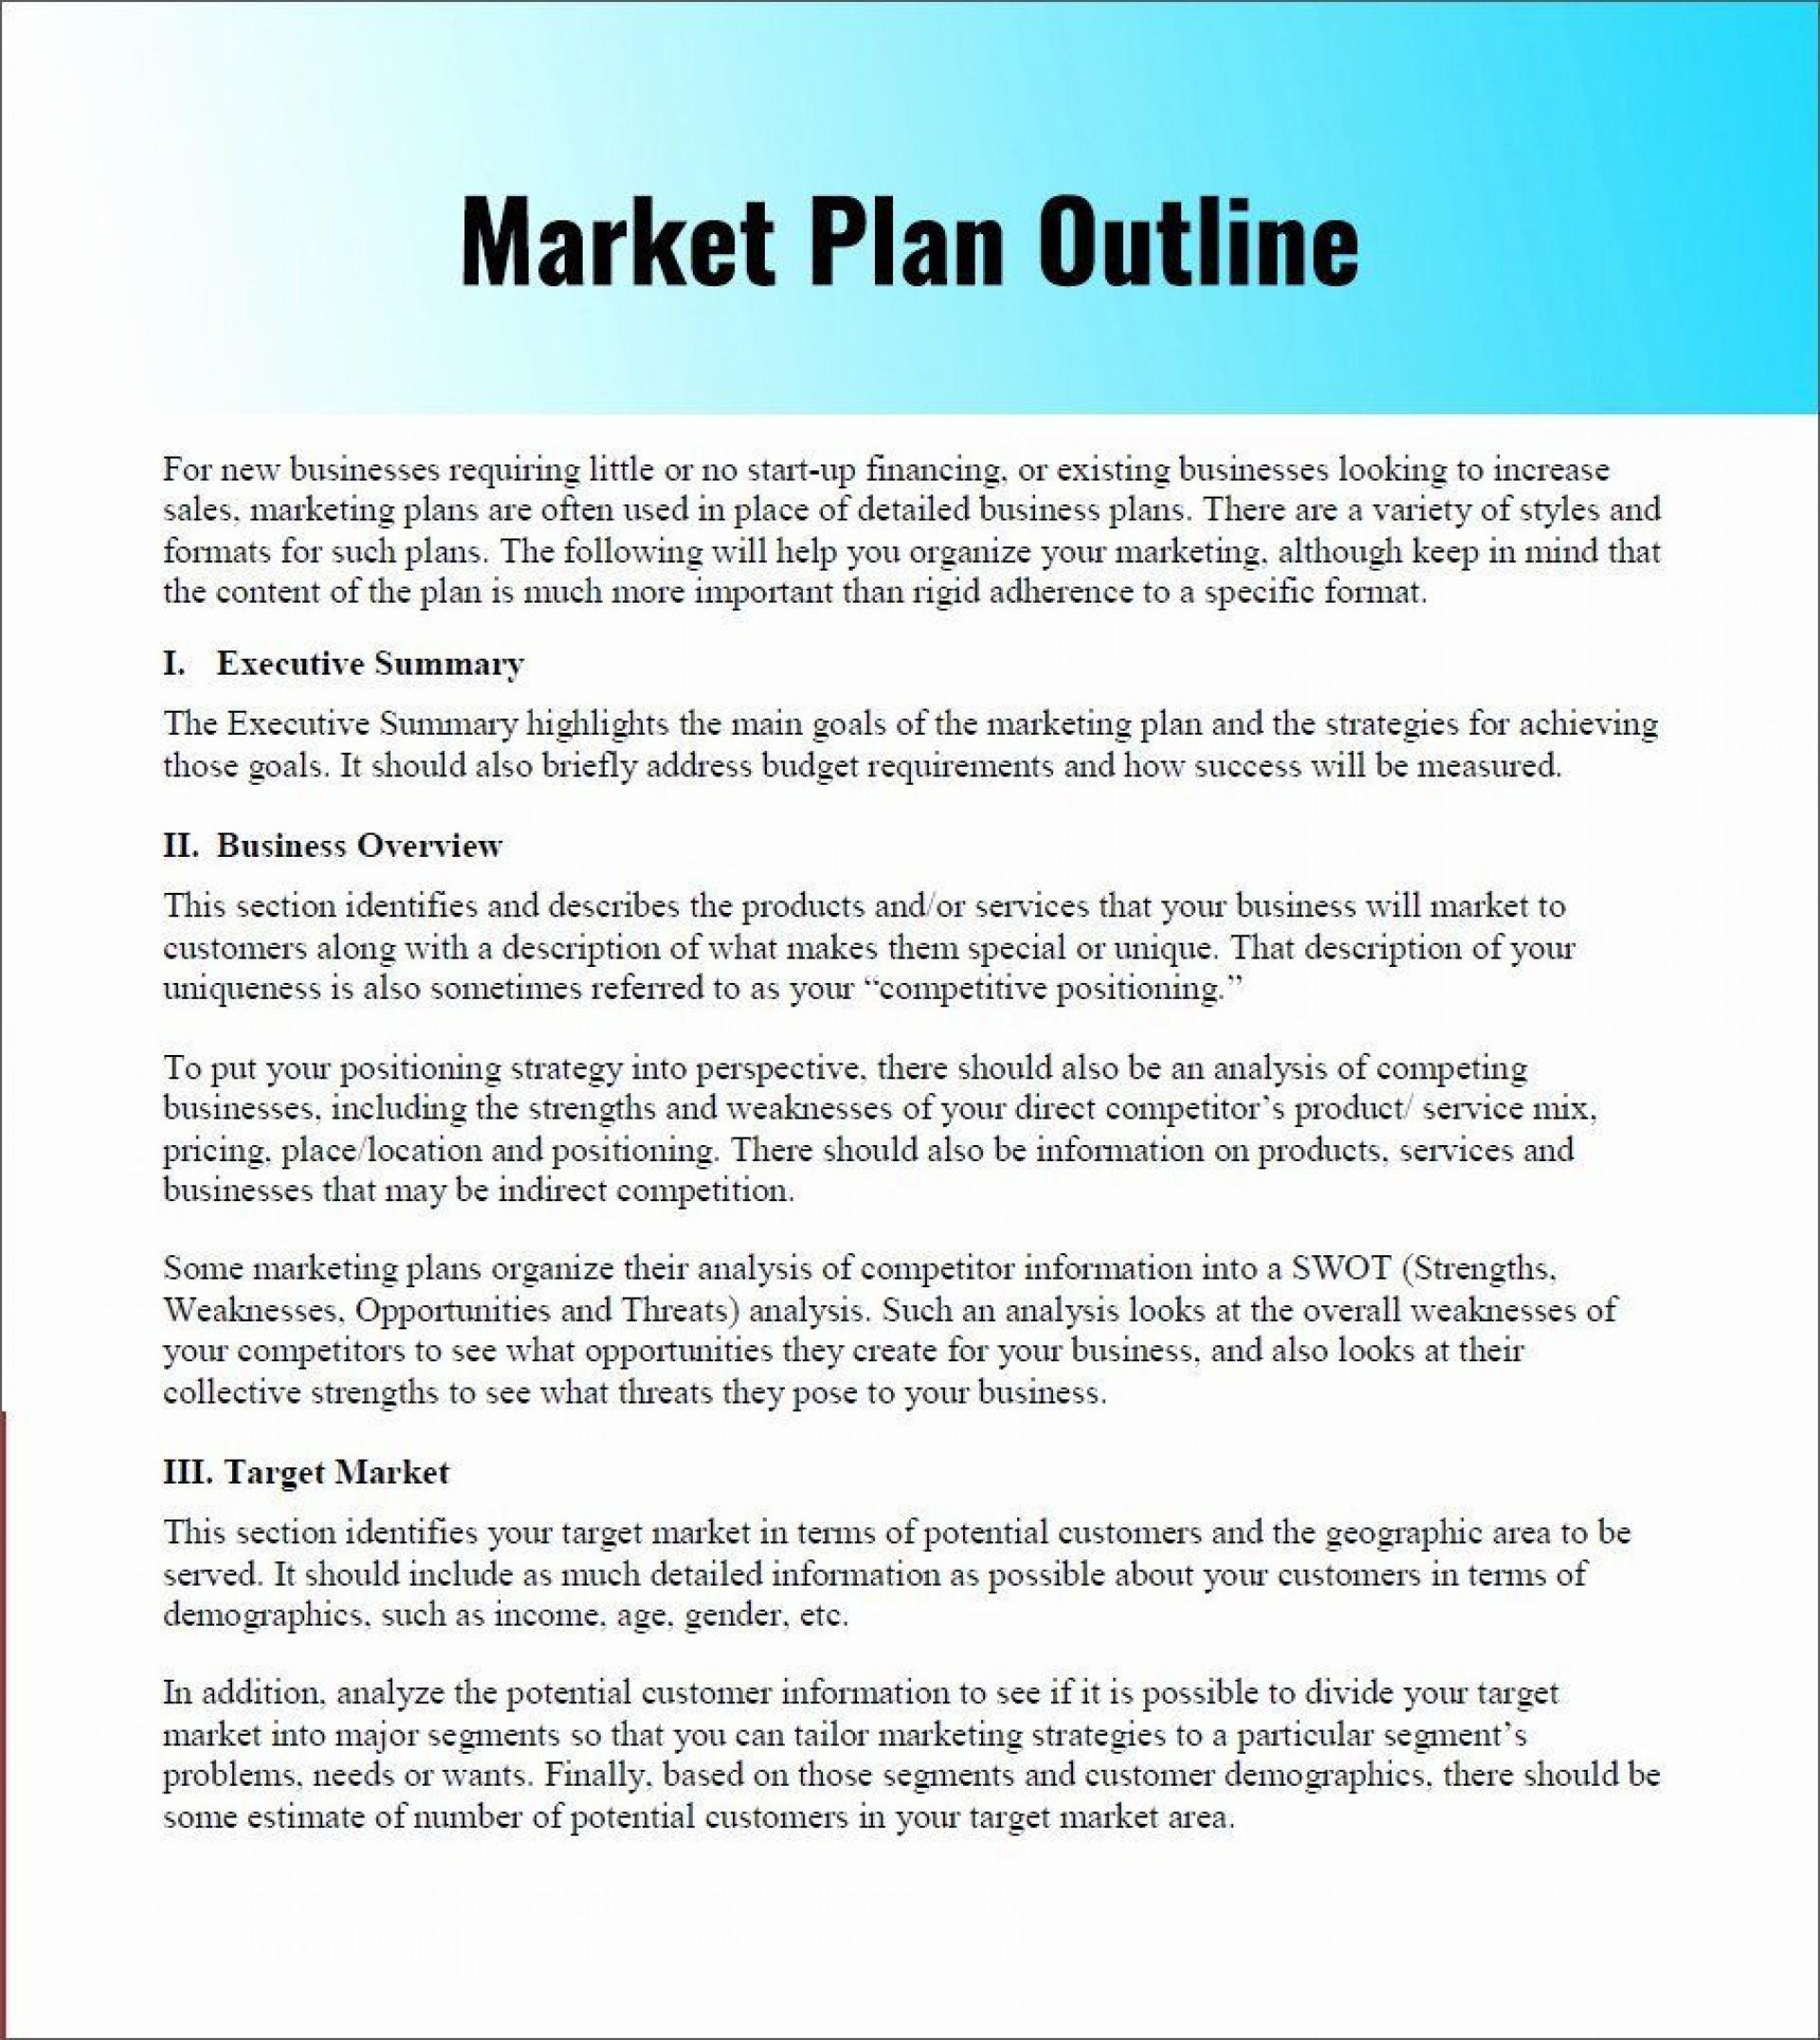 003 Best Restaurant Marketing Plan Template Free Download High Def 1920